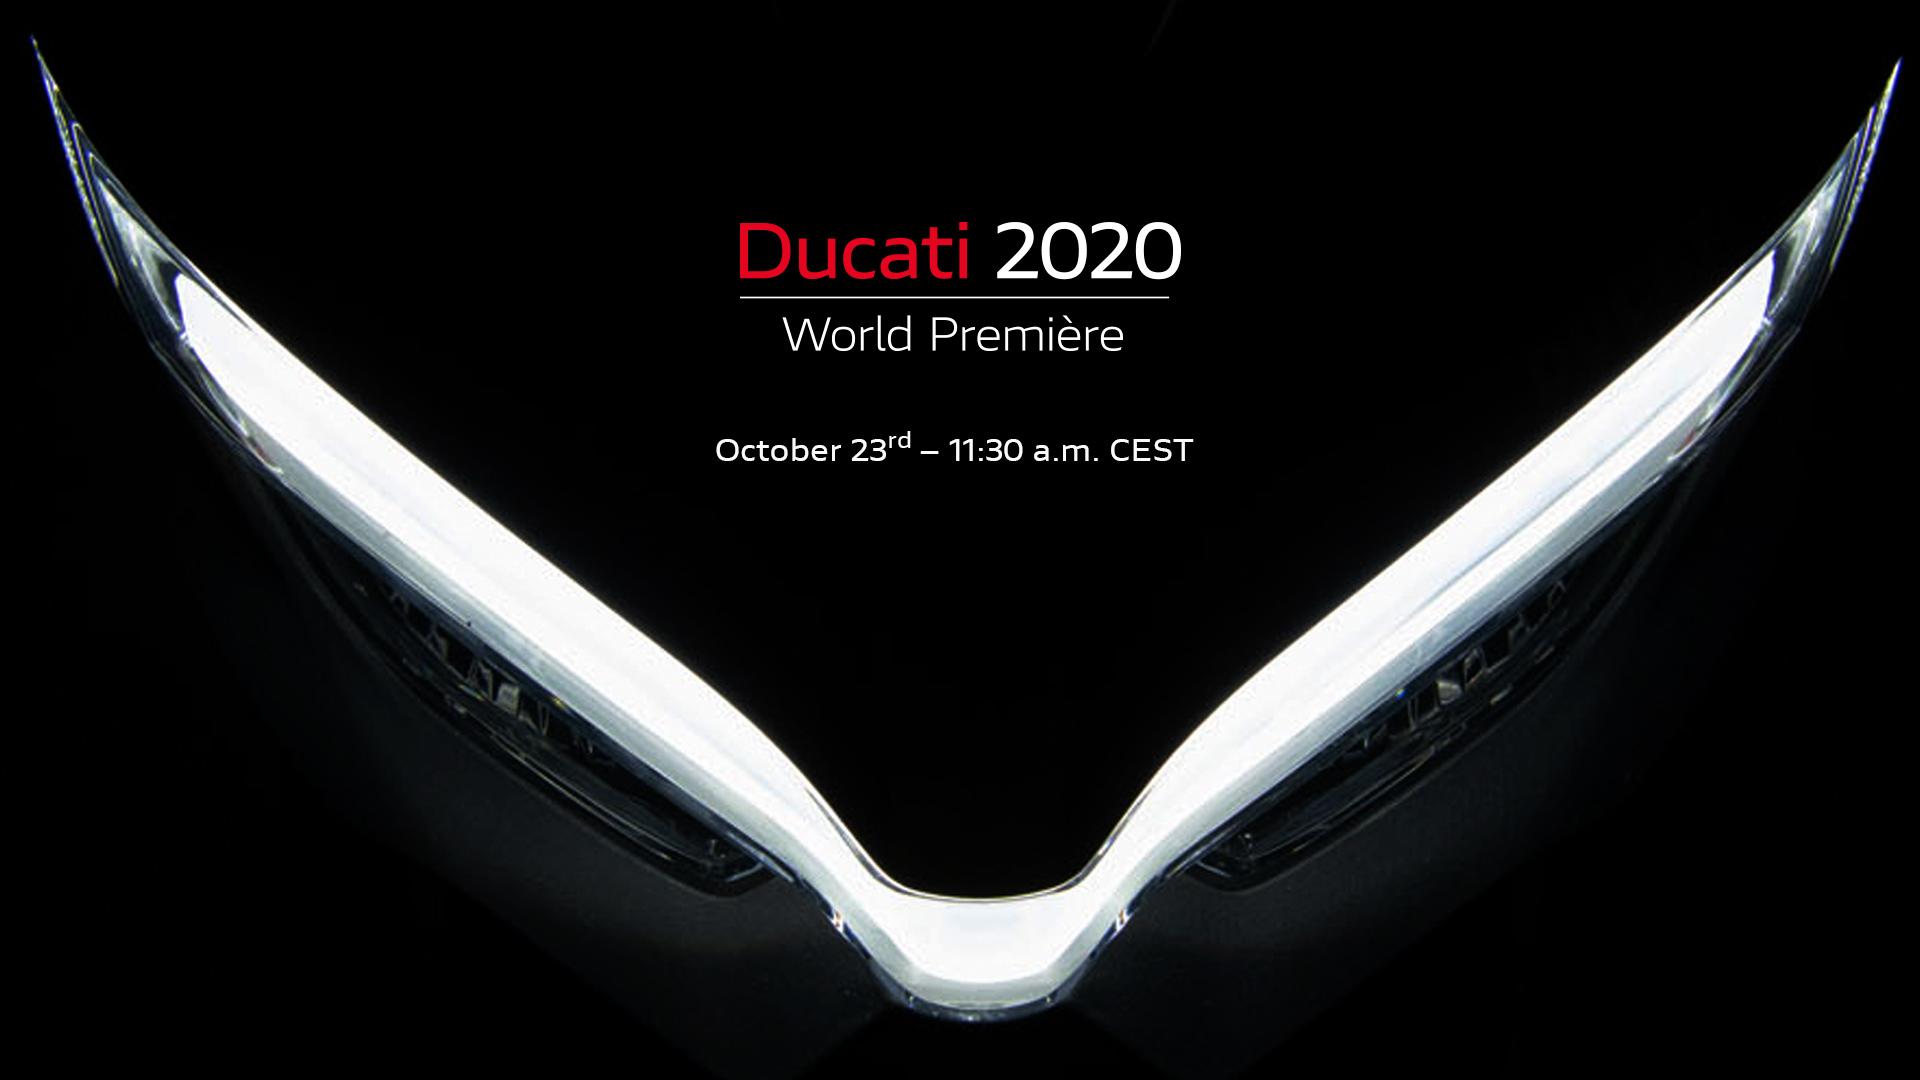 Ducati World Première2020